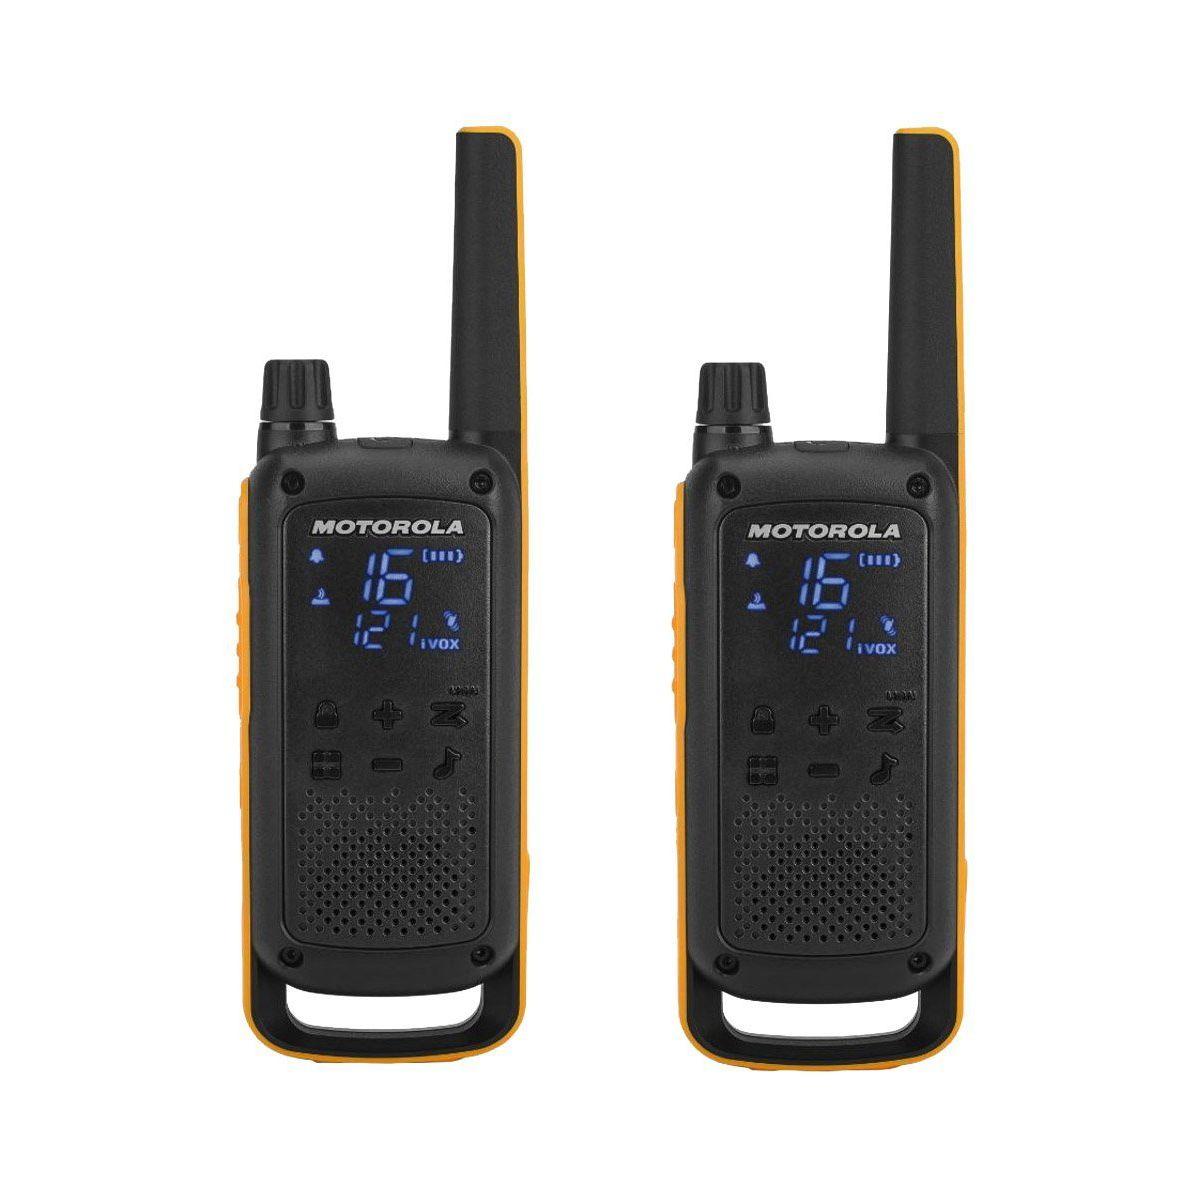 Talkie walkie MOTOROLA T82 Extreme Twin Noir/Jaune (photo)